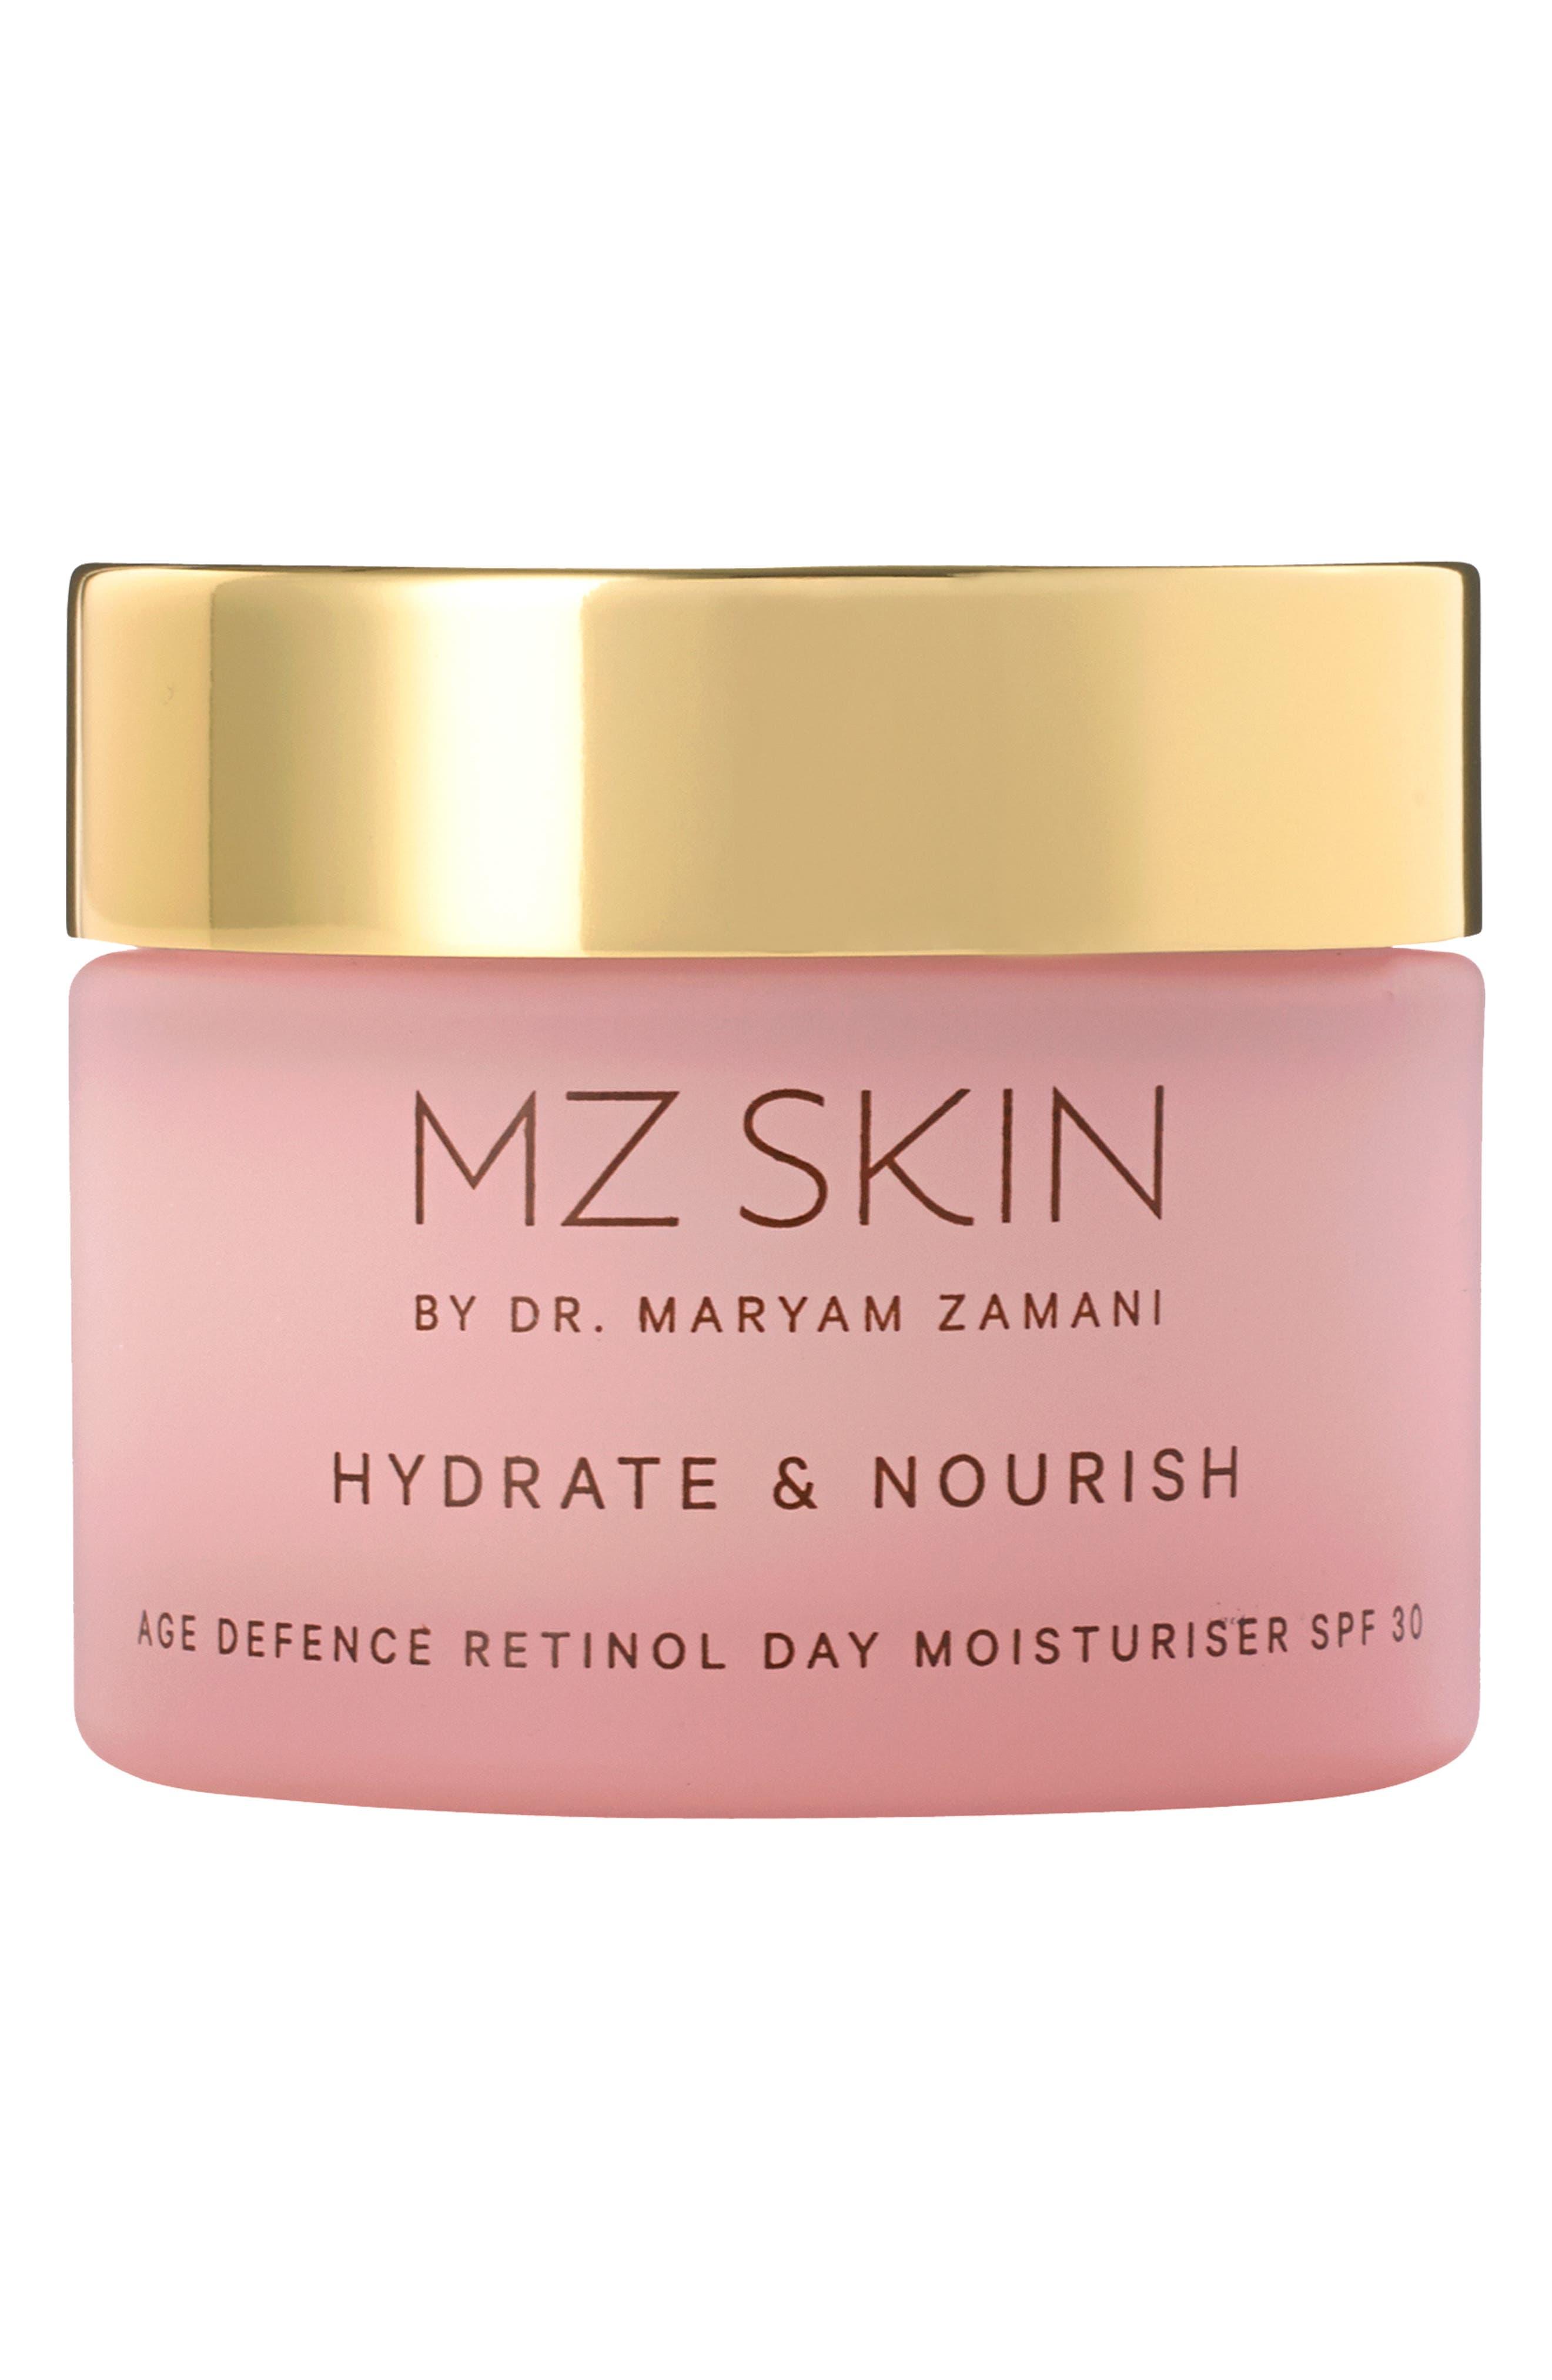 Hydrate & Nourish Age Defense Retinol Moisturizer Spf 30